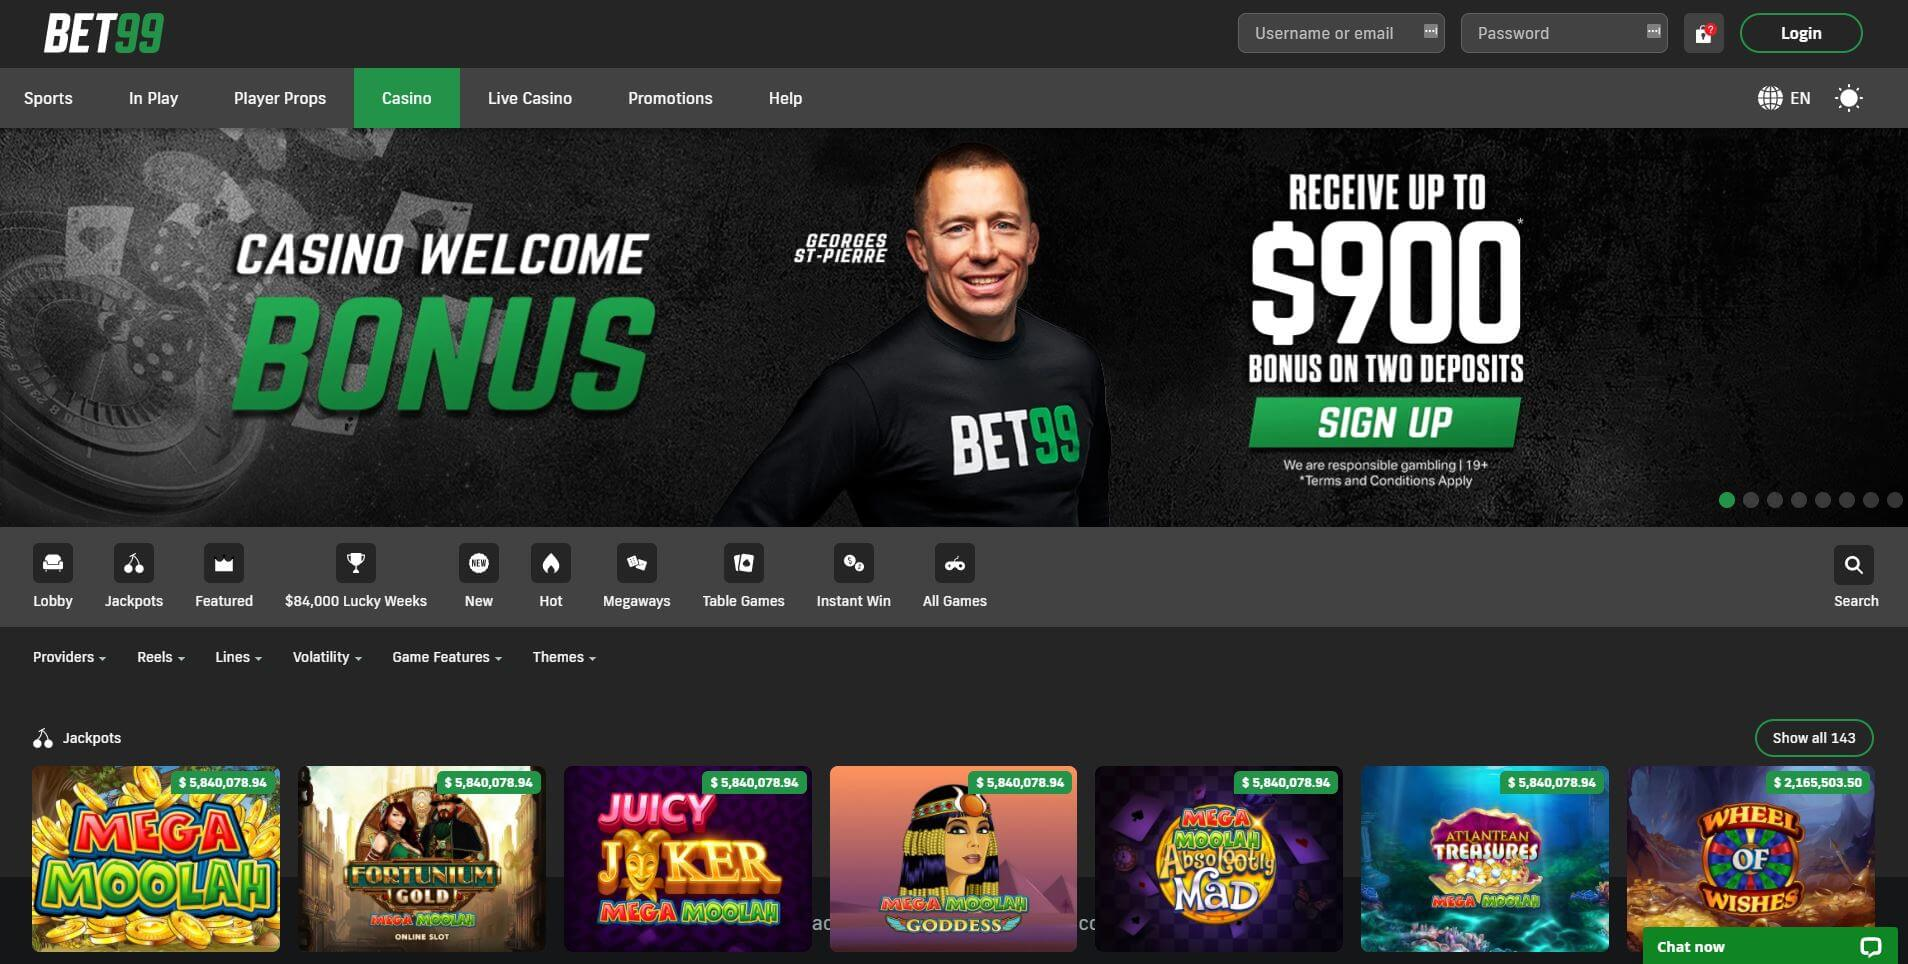 Bet99 Casino Games